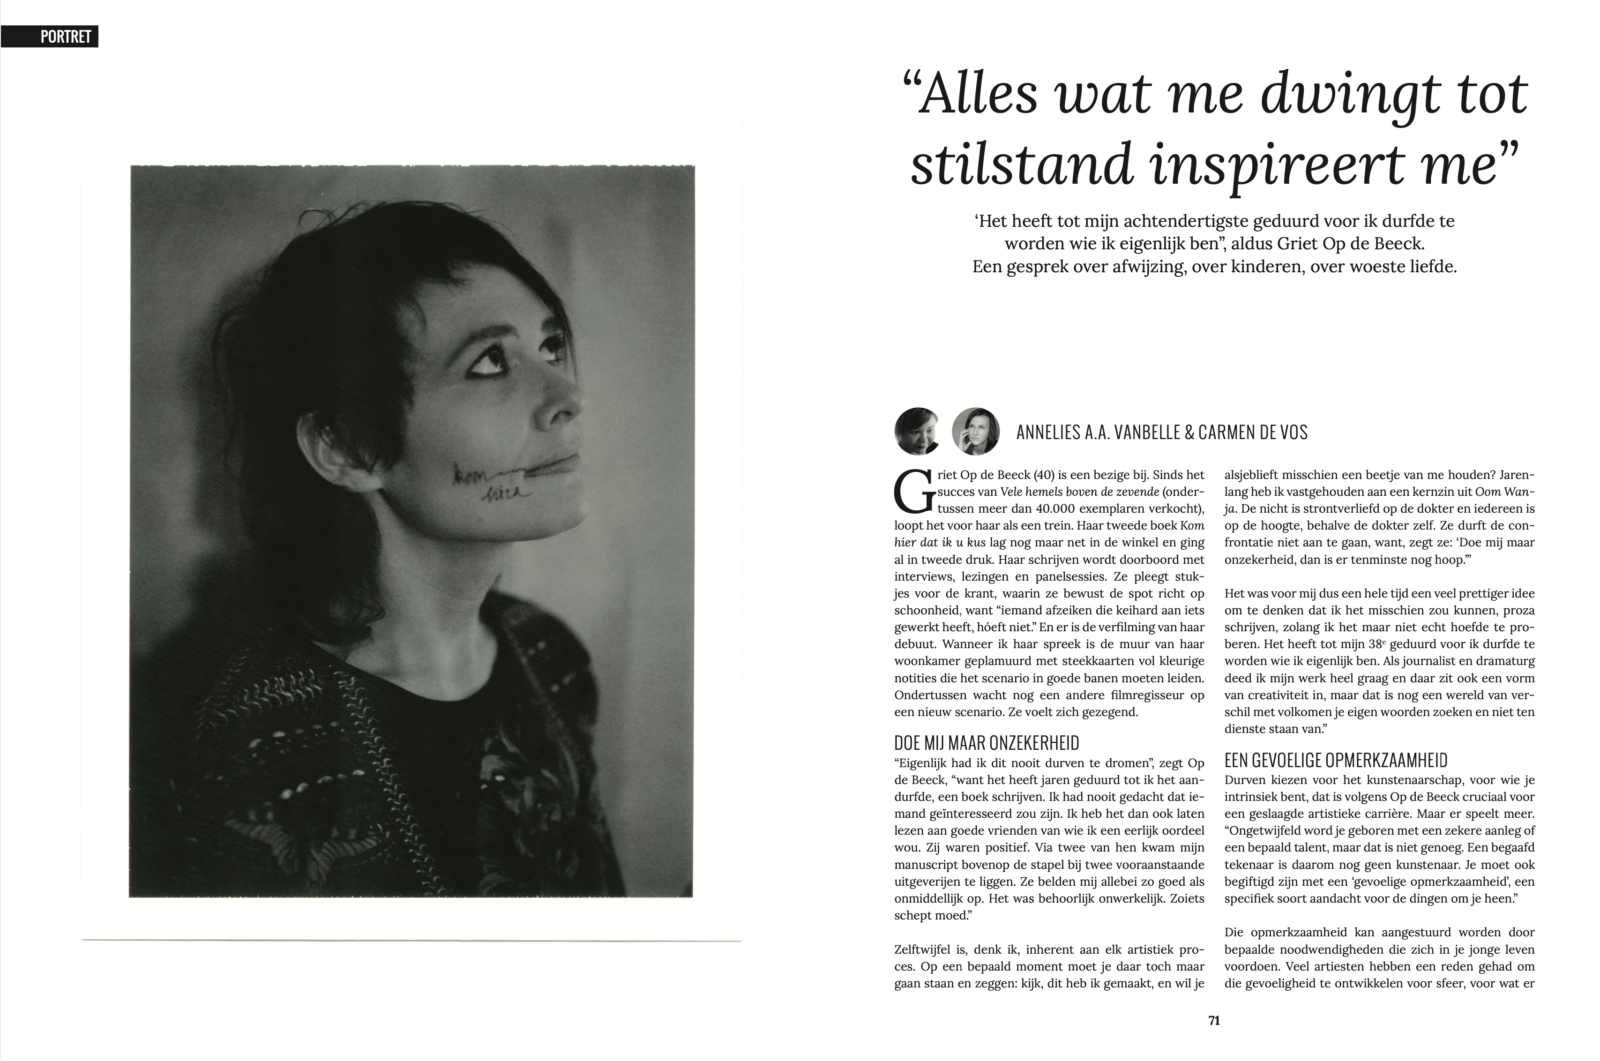 GrietOpdeBeeck CharlieMagazine